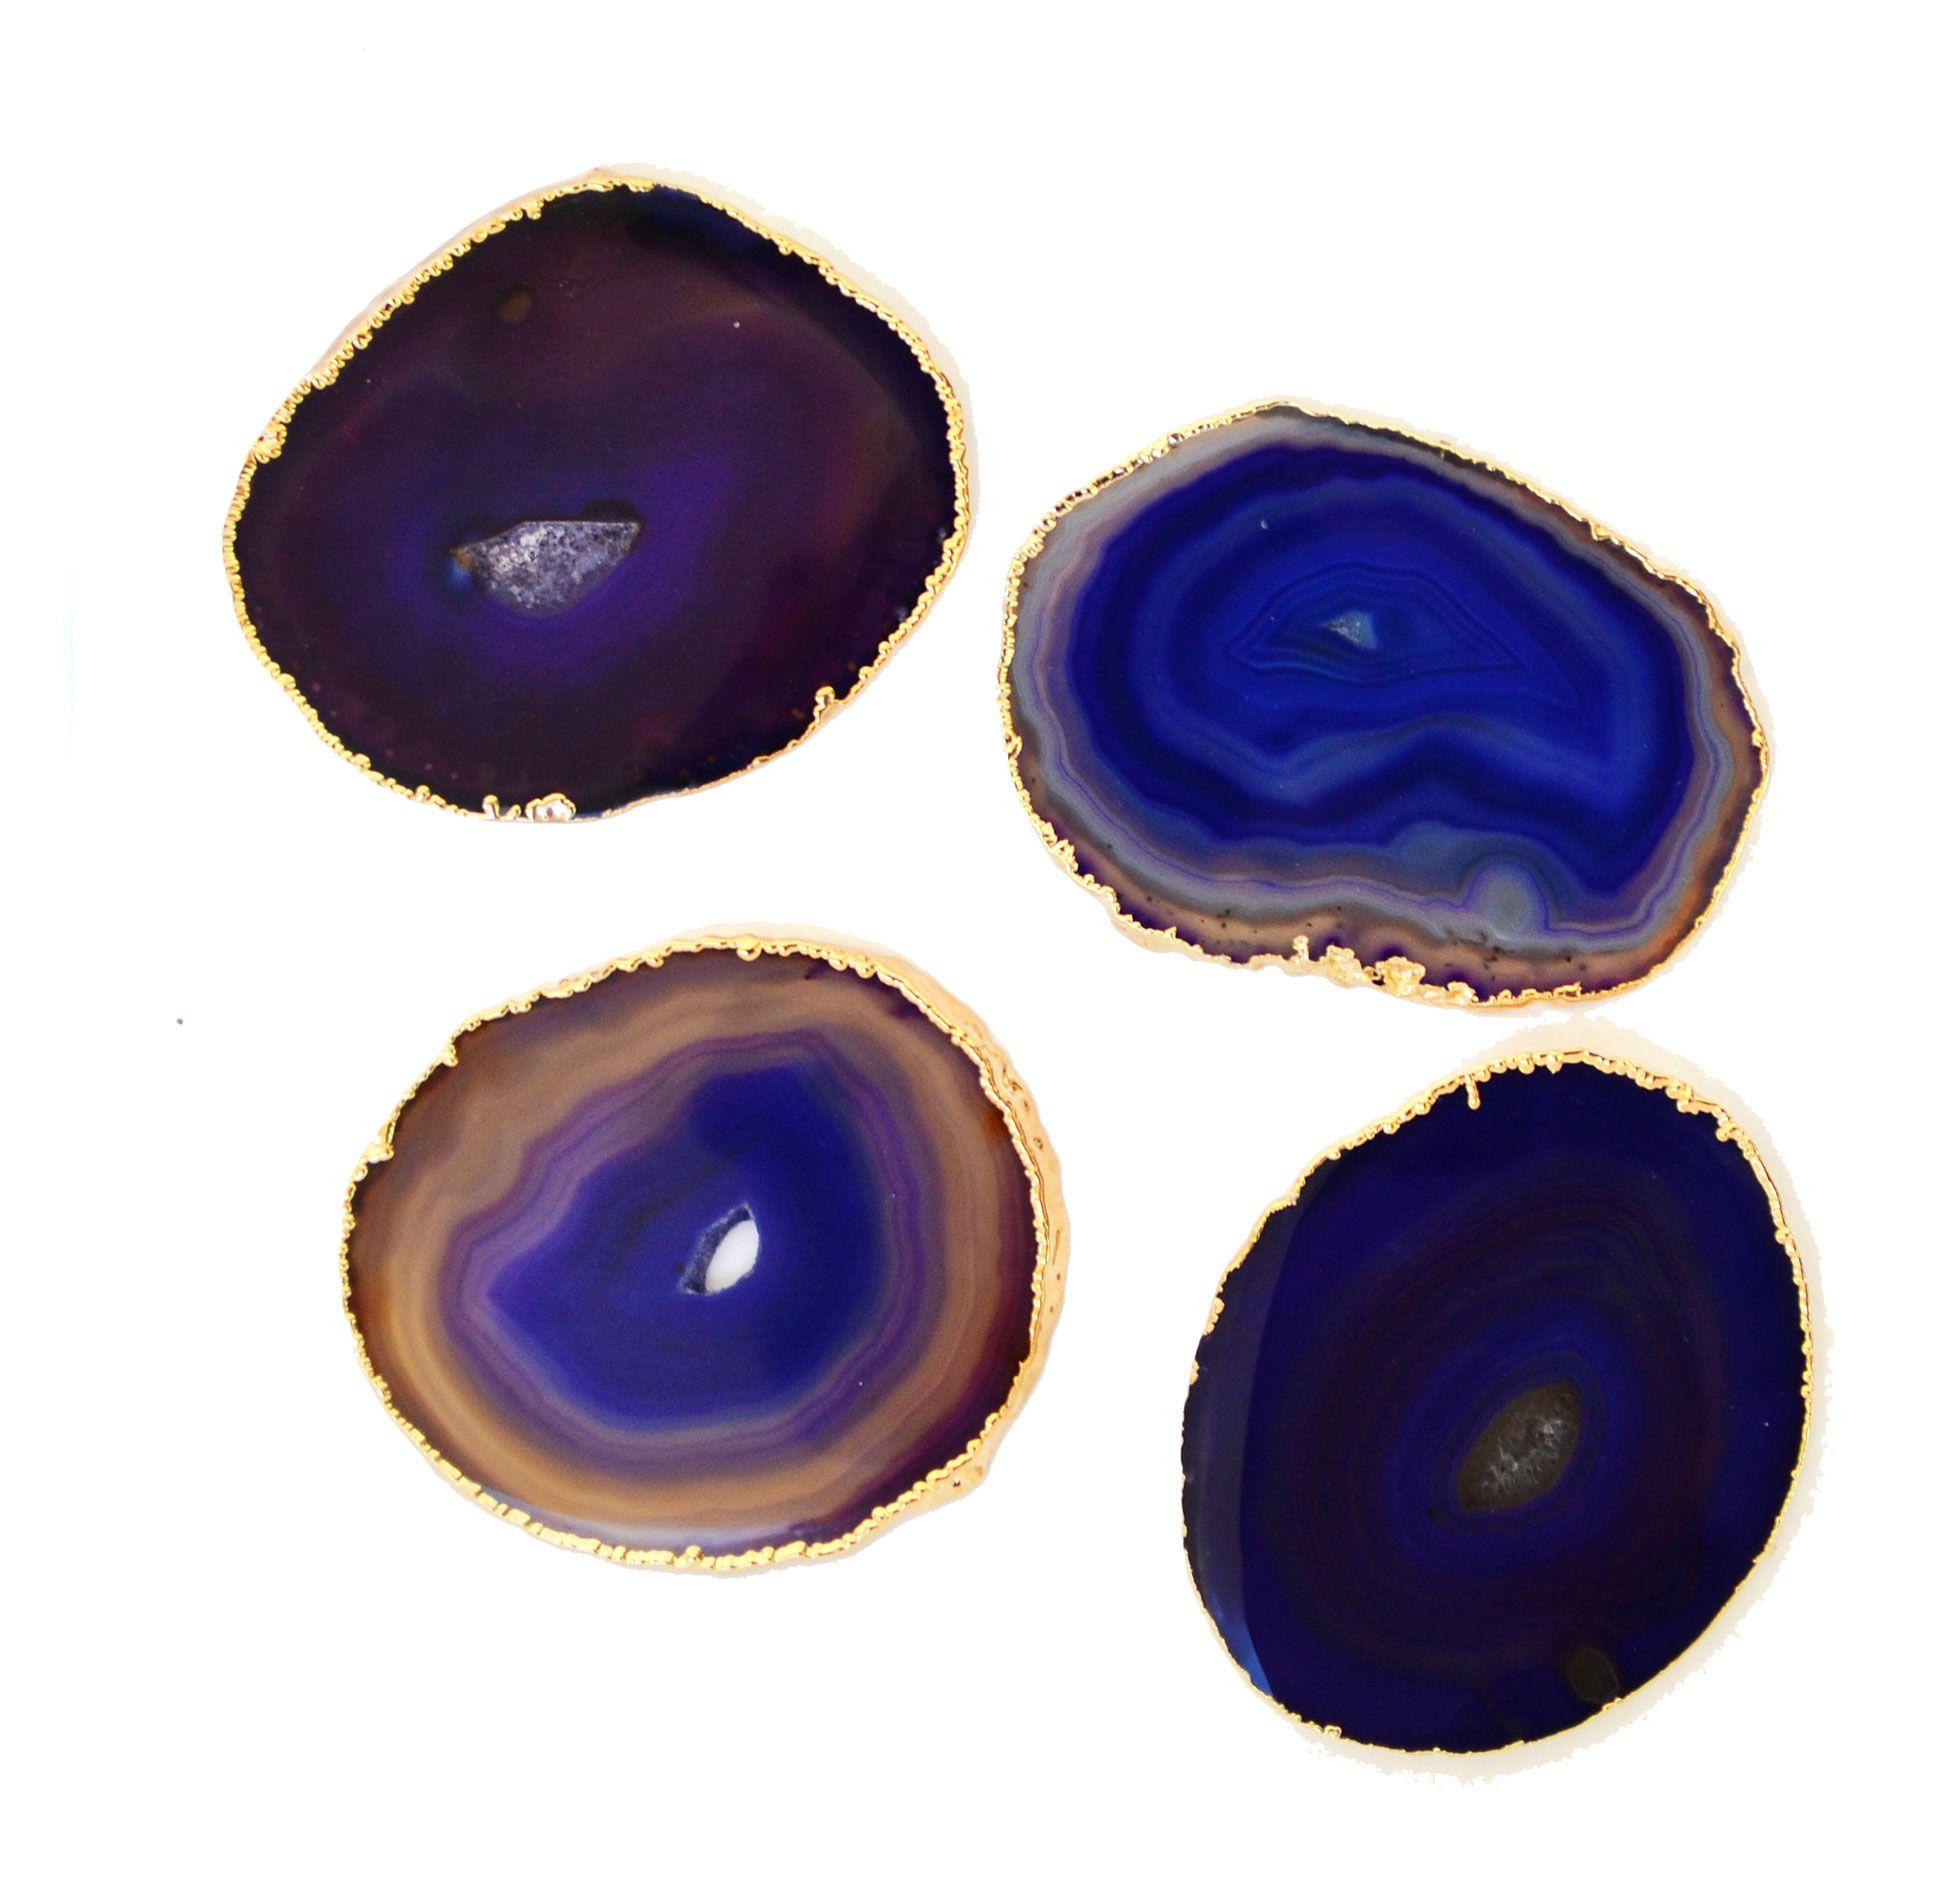 Agate Gilded Coaster Set, Purple